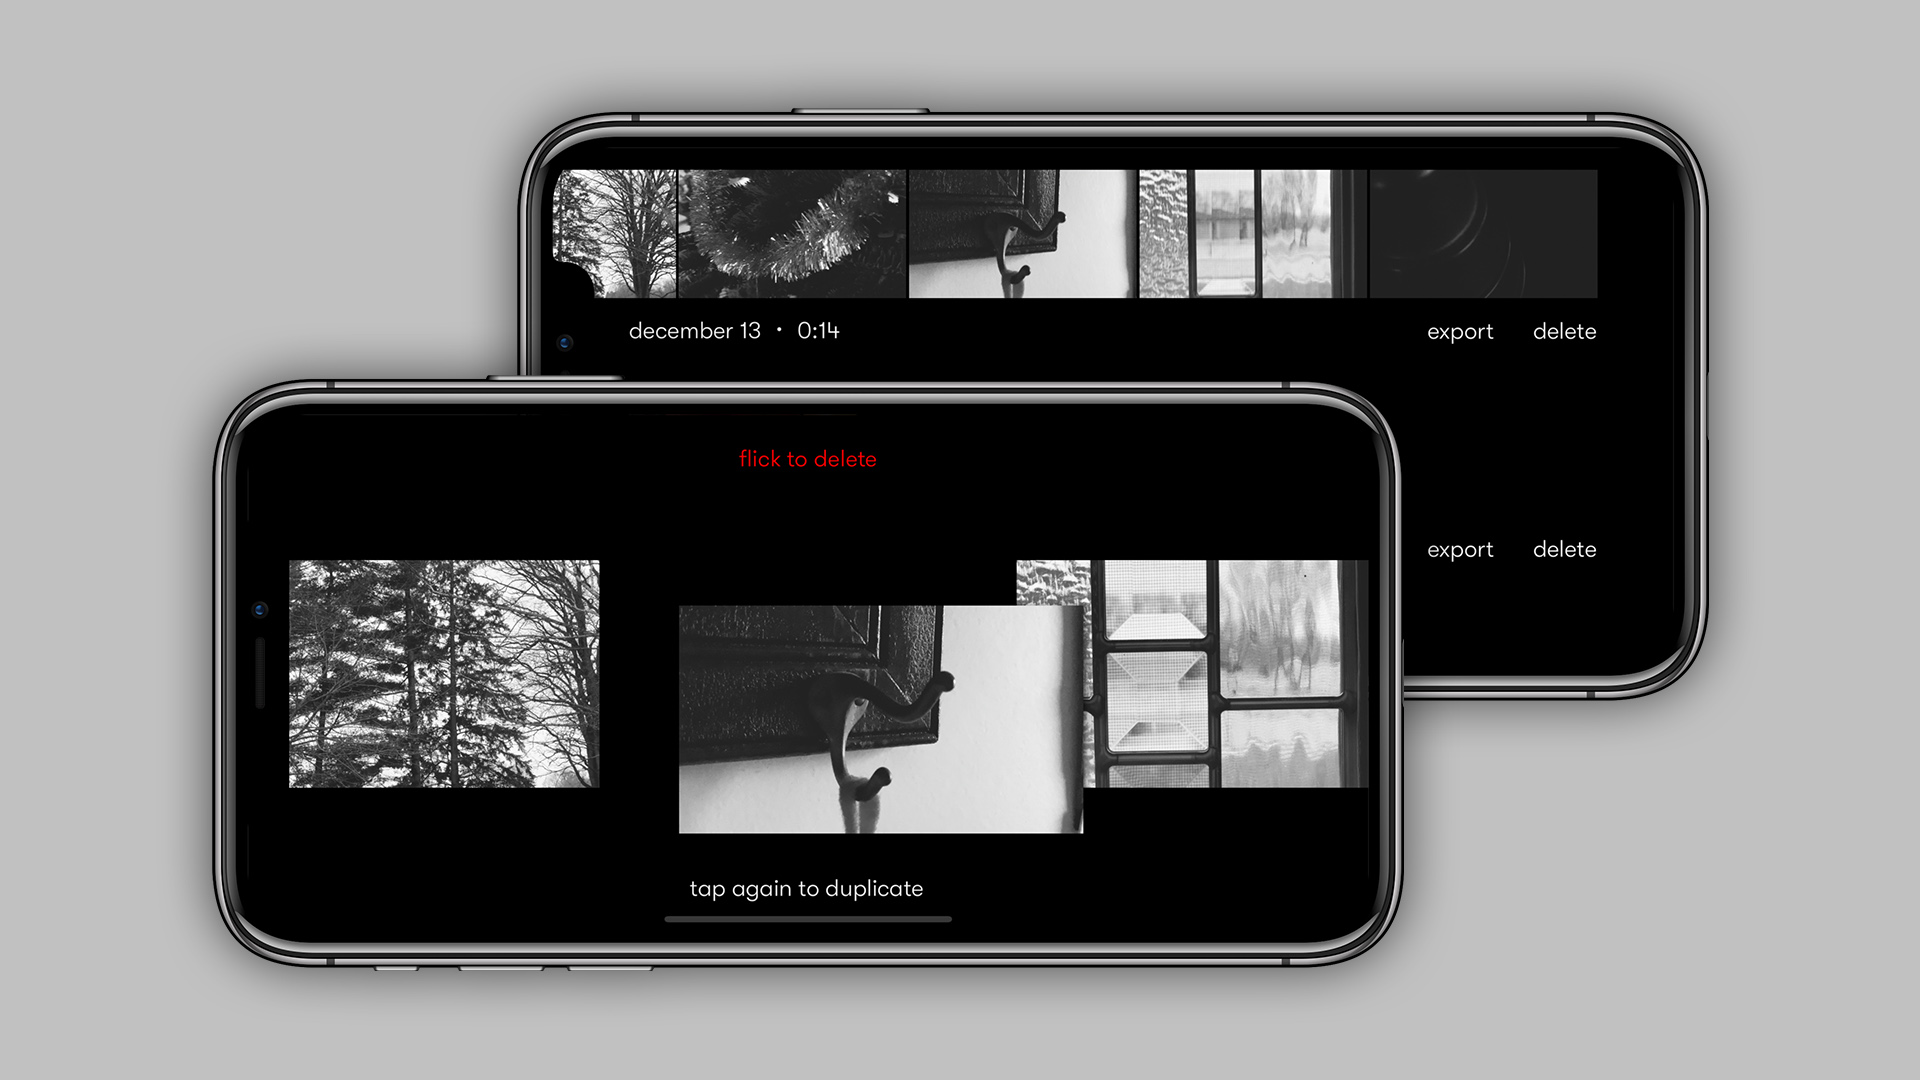 iOS filmmaking app Nizo lets you edit video as you shoot